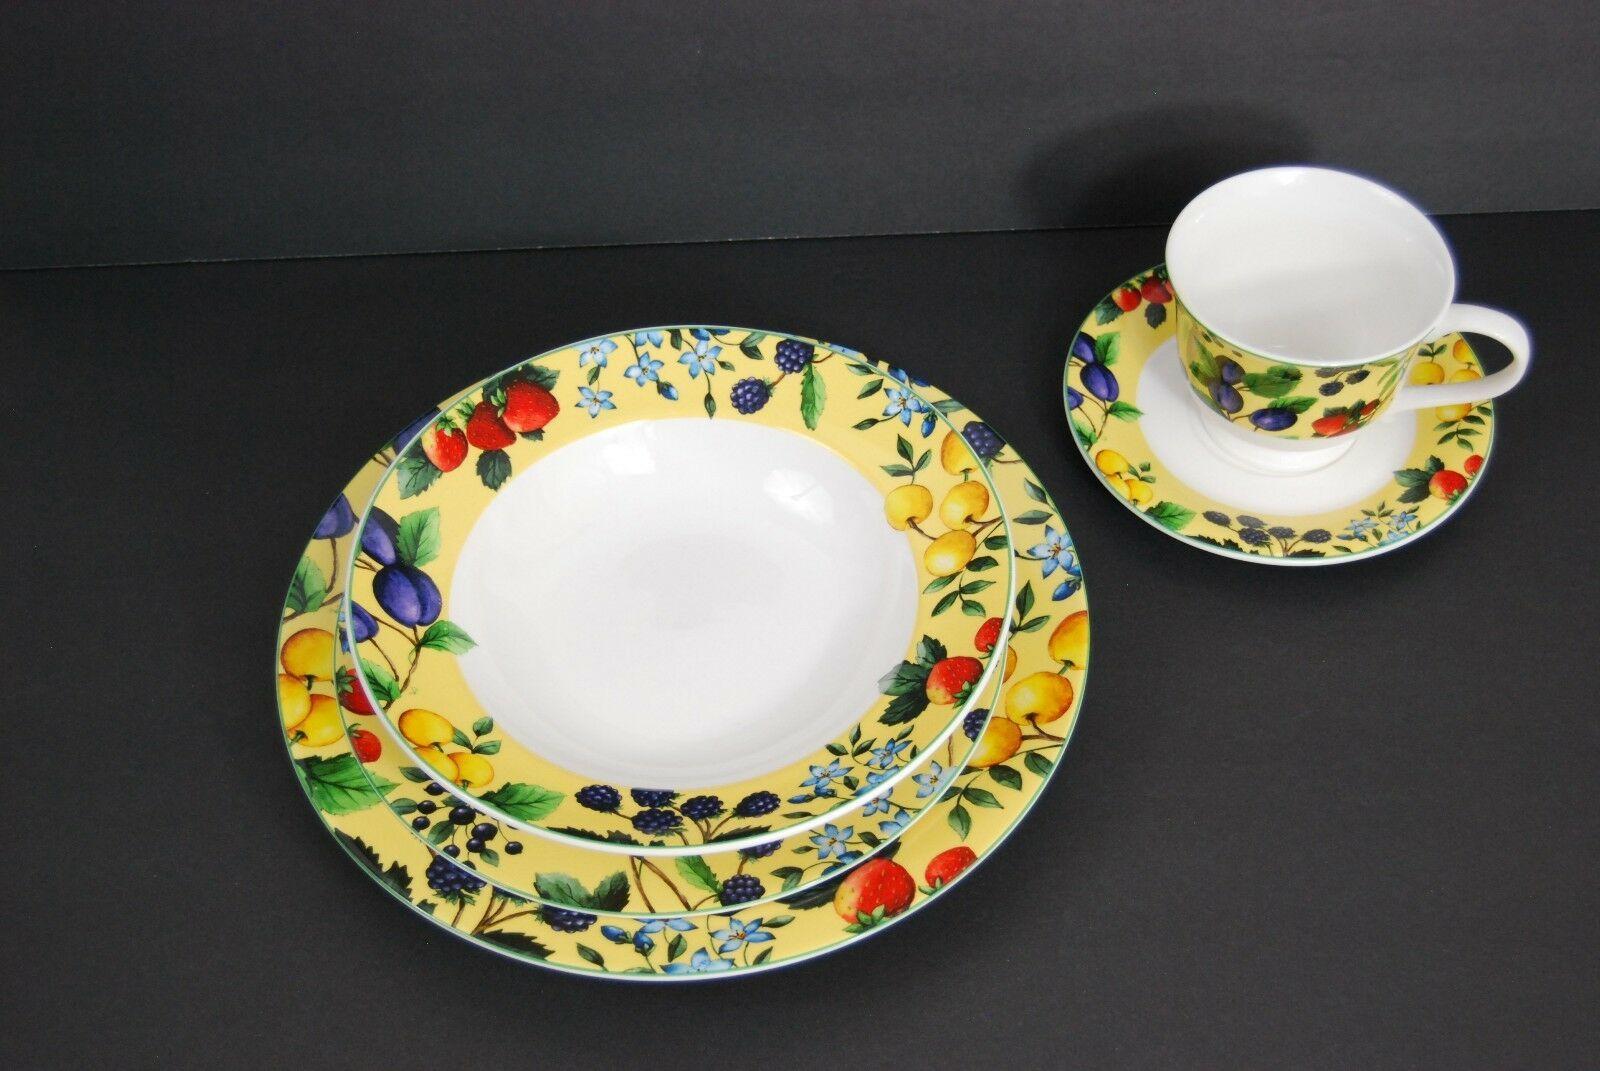 Gibson Elite Claire Murray Bella Sola Yellow Fruit & Berries Plates, Dinnerware image 2